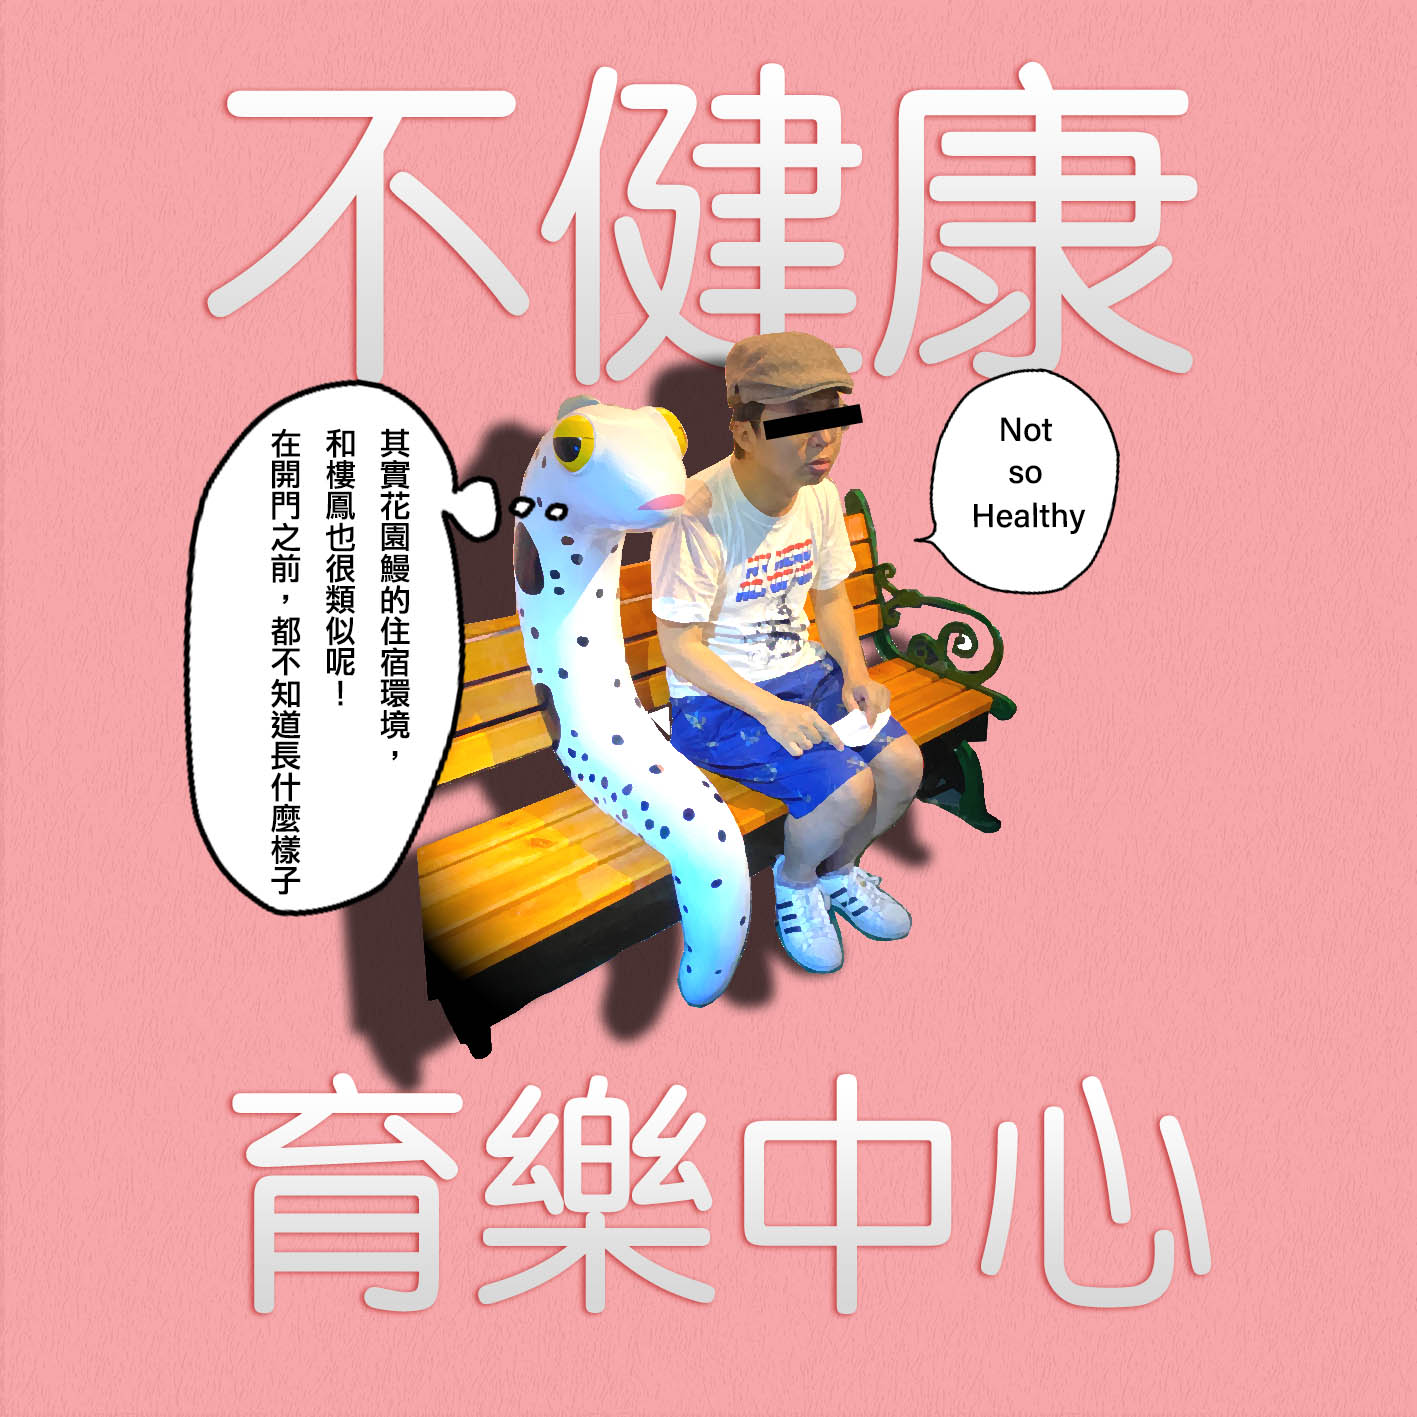 EP51 - 會客室:台灣樓鳳與性產業研究達人 張榮哲。和專業人士研討台灣性產業的發展,以及論文裡面被刪掉的精華!